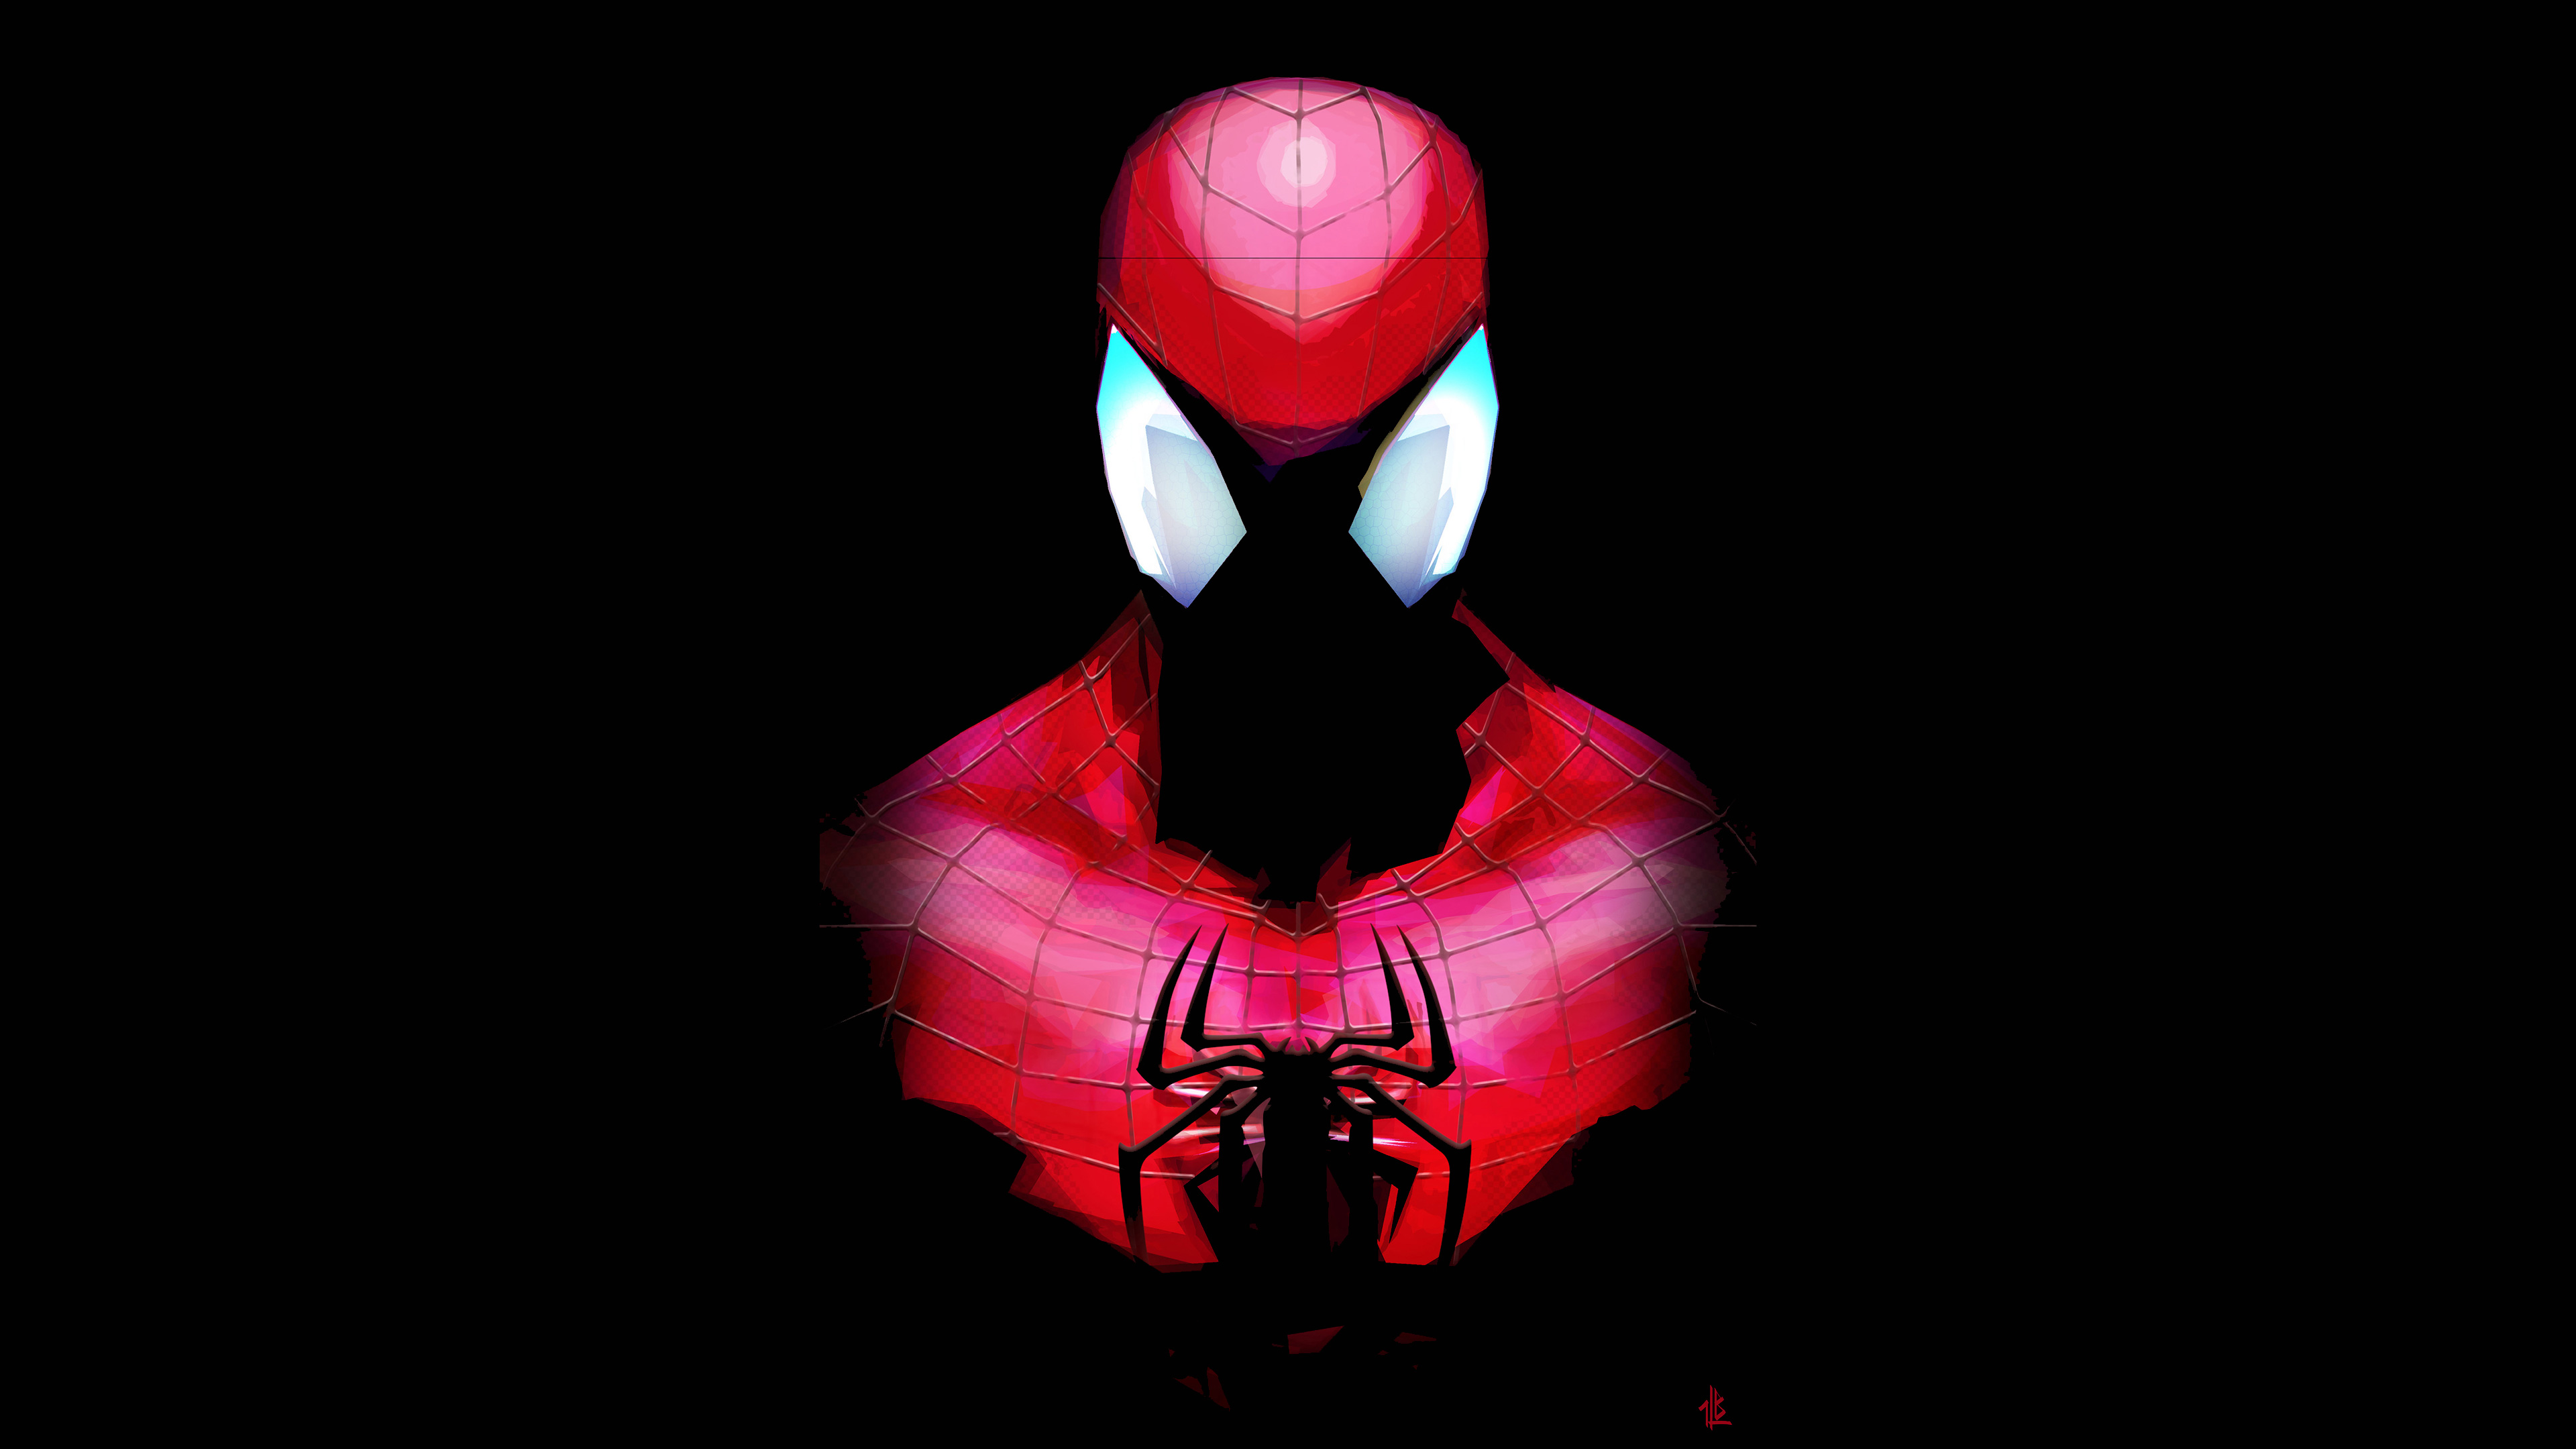 spiderman 4k 2018 art 1536523616 - Spiderman 4k 2018 Art - superheroes wallpapers, spiderman wallpapers, hd-wallpapers, digital art wallpapers, artwork wallpapers, artstation wallpapers, artist wallpapers, 4k-wallpapers